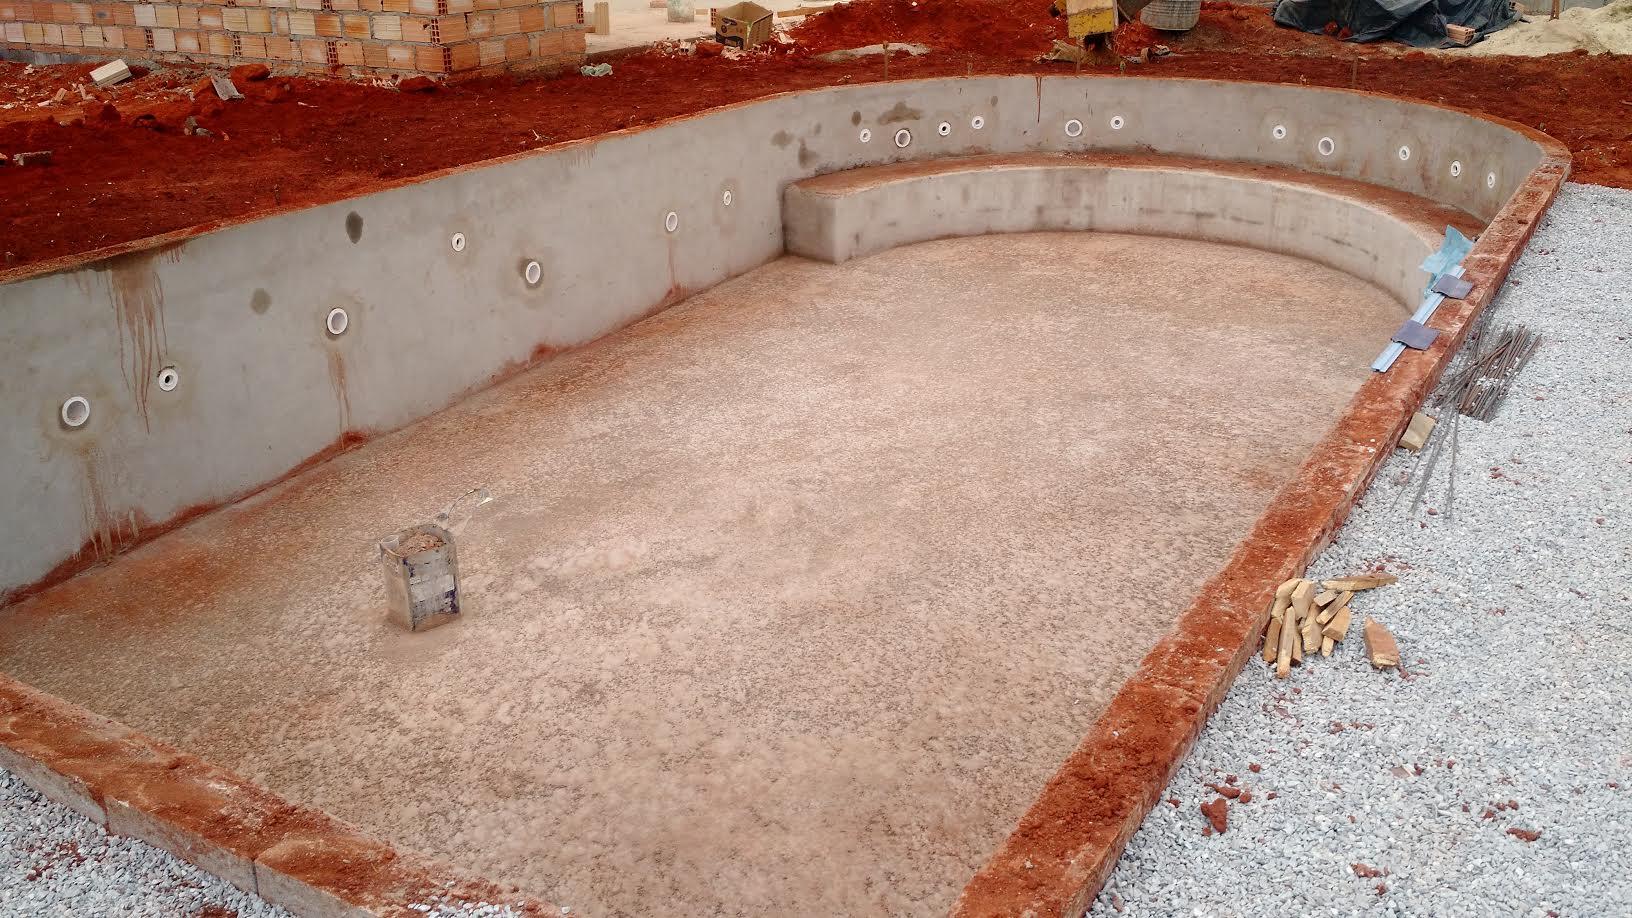 Piscina de vinil passo a passo: Parte hidráulica da piscina